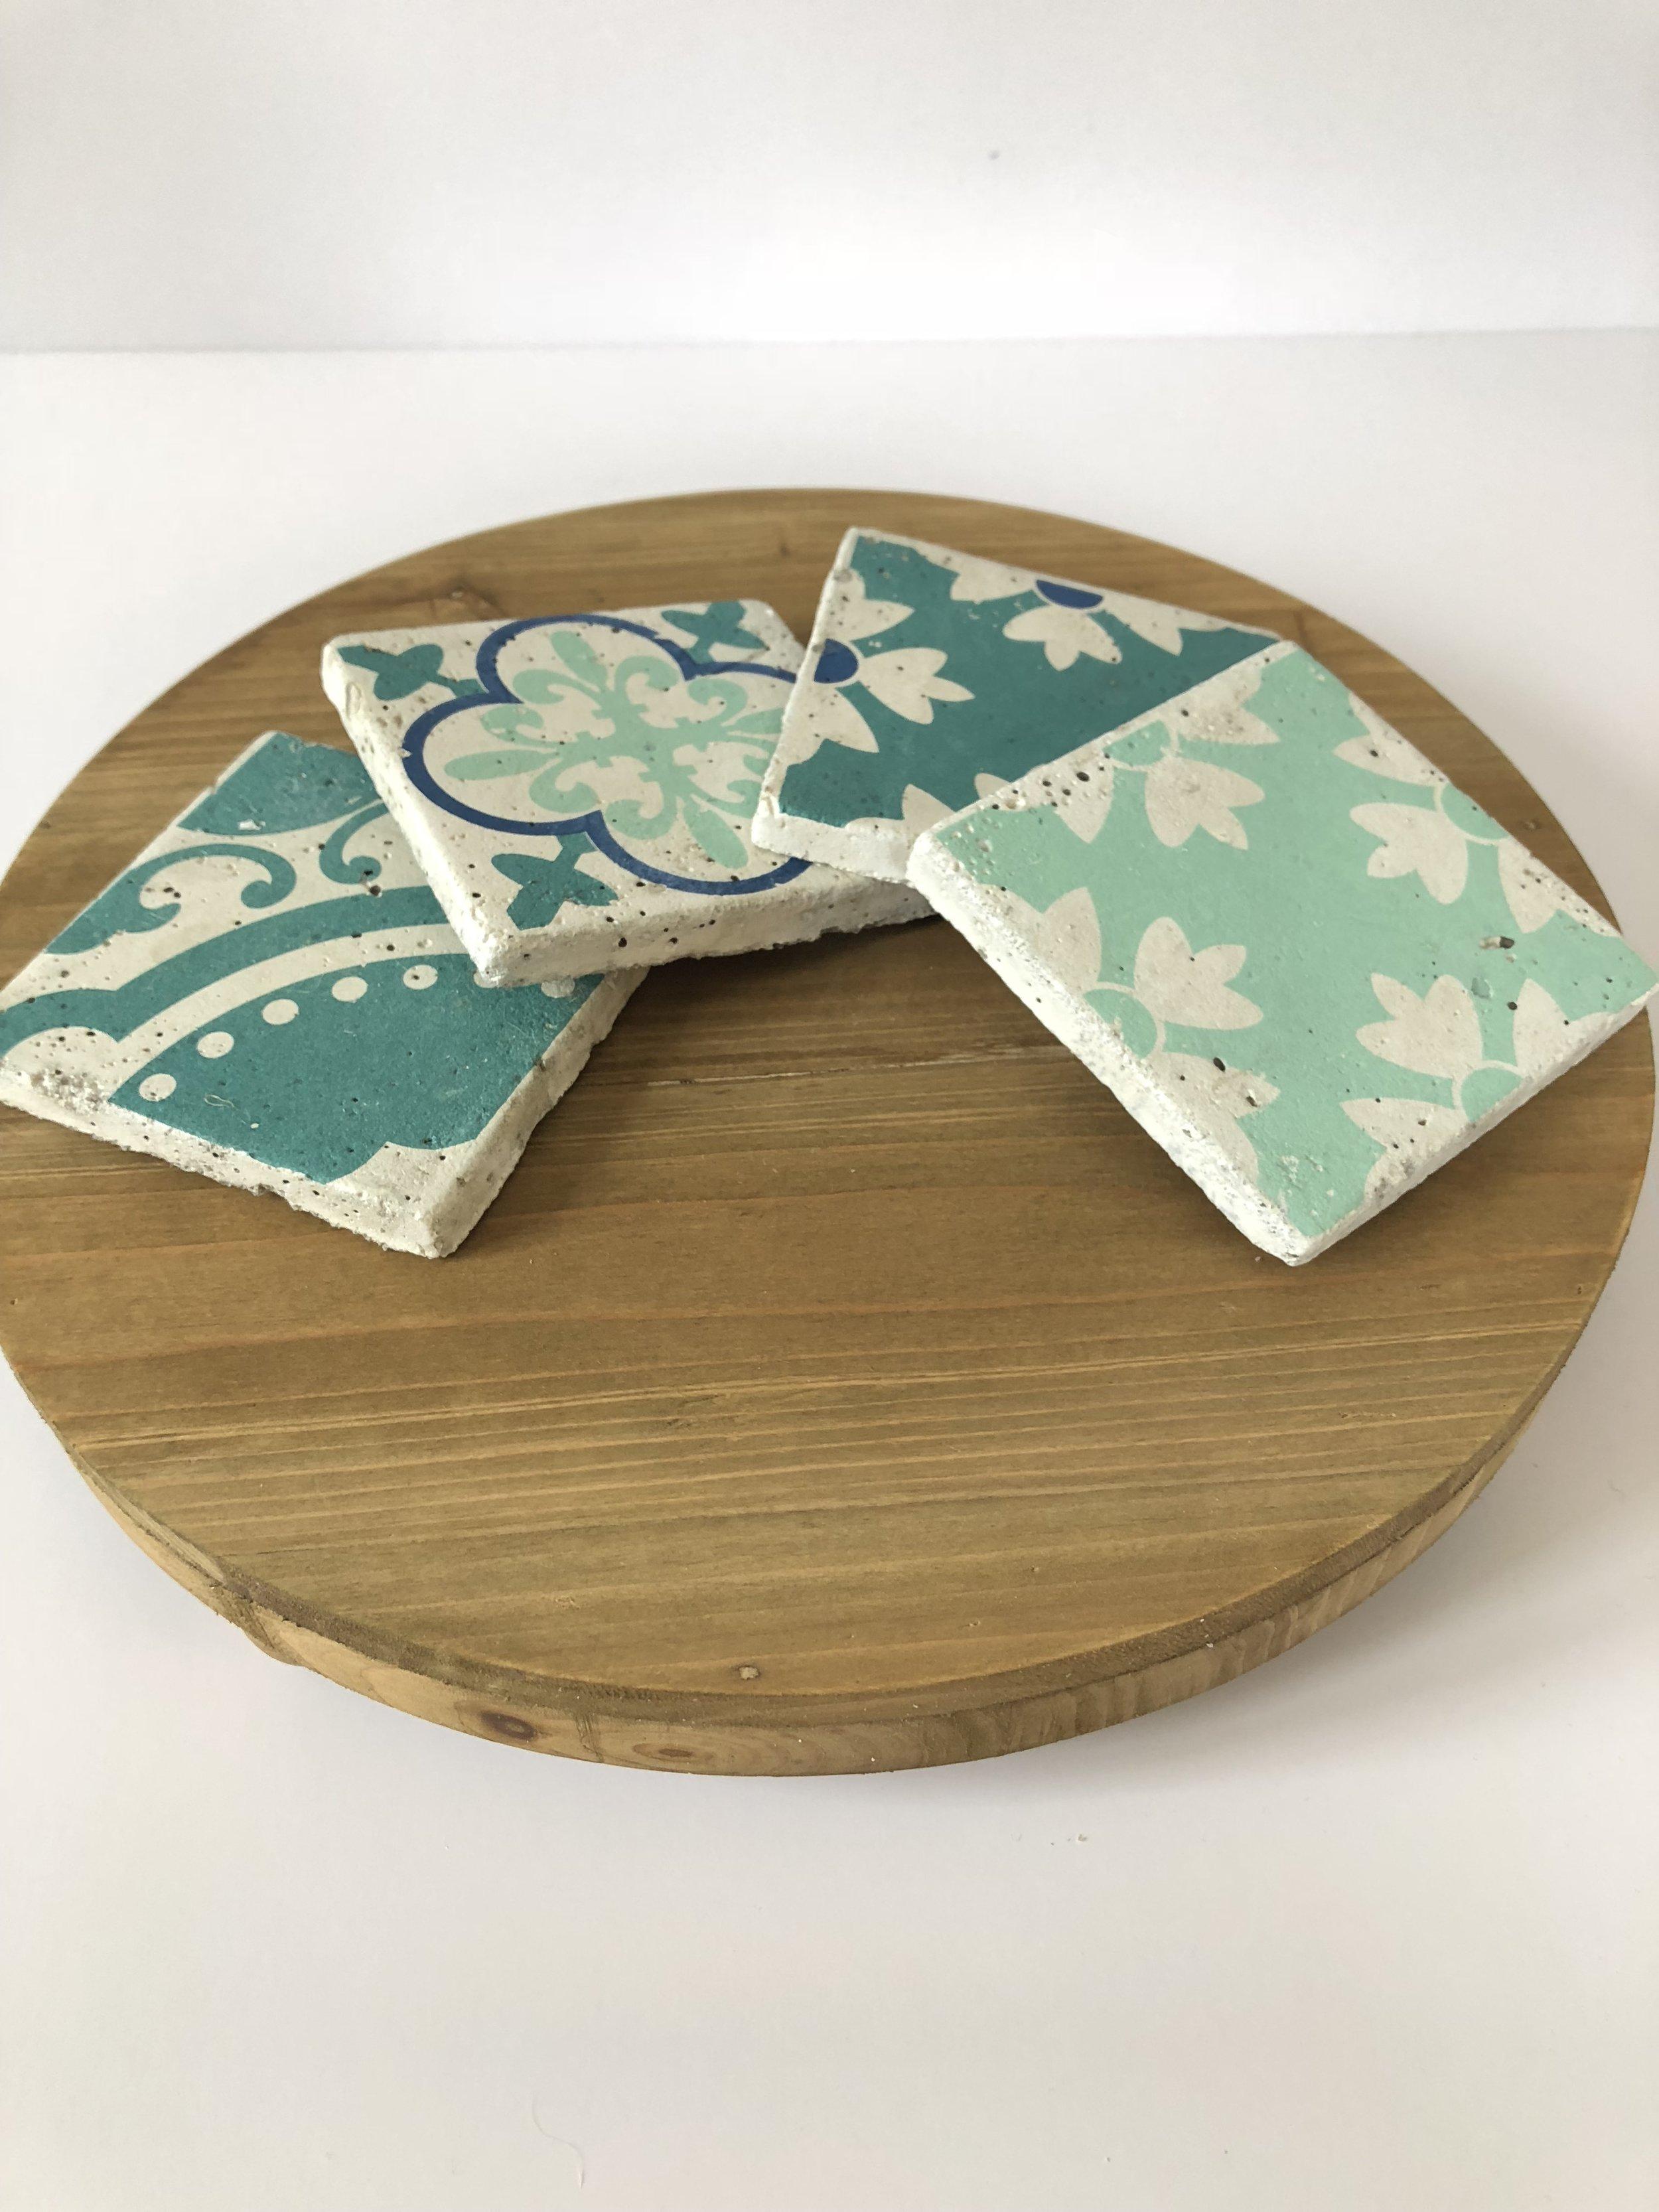 Aqua Cement Tile Coasters